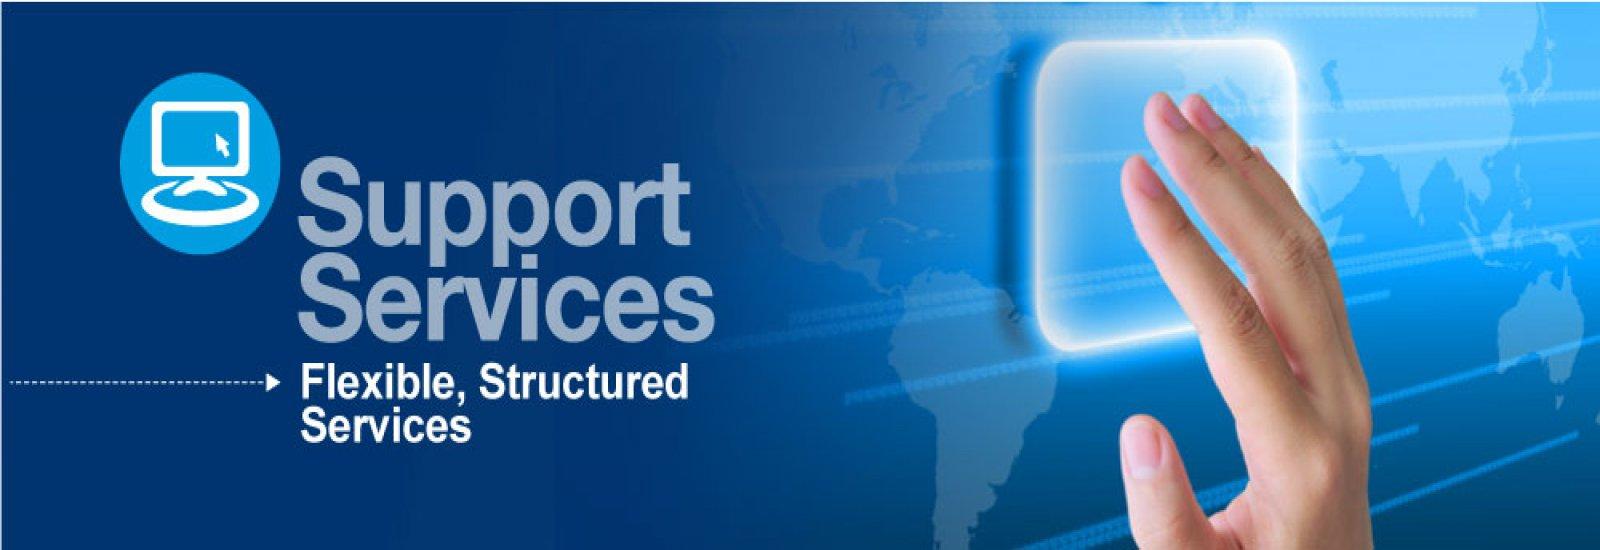 Support-Services-header